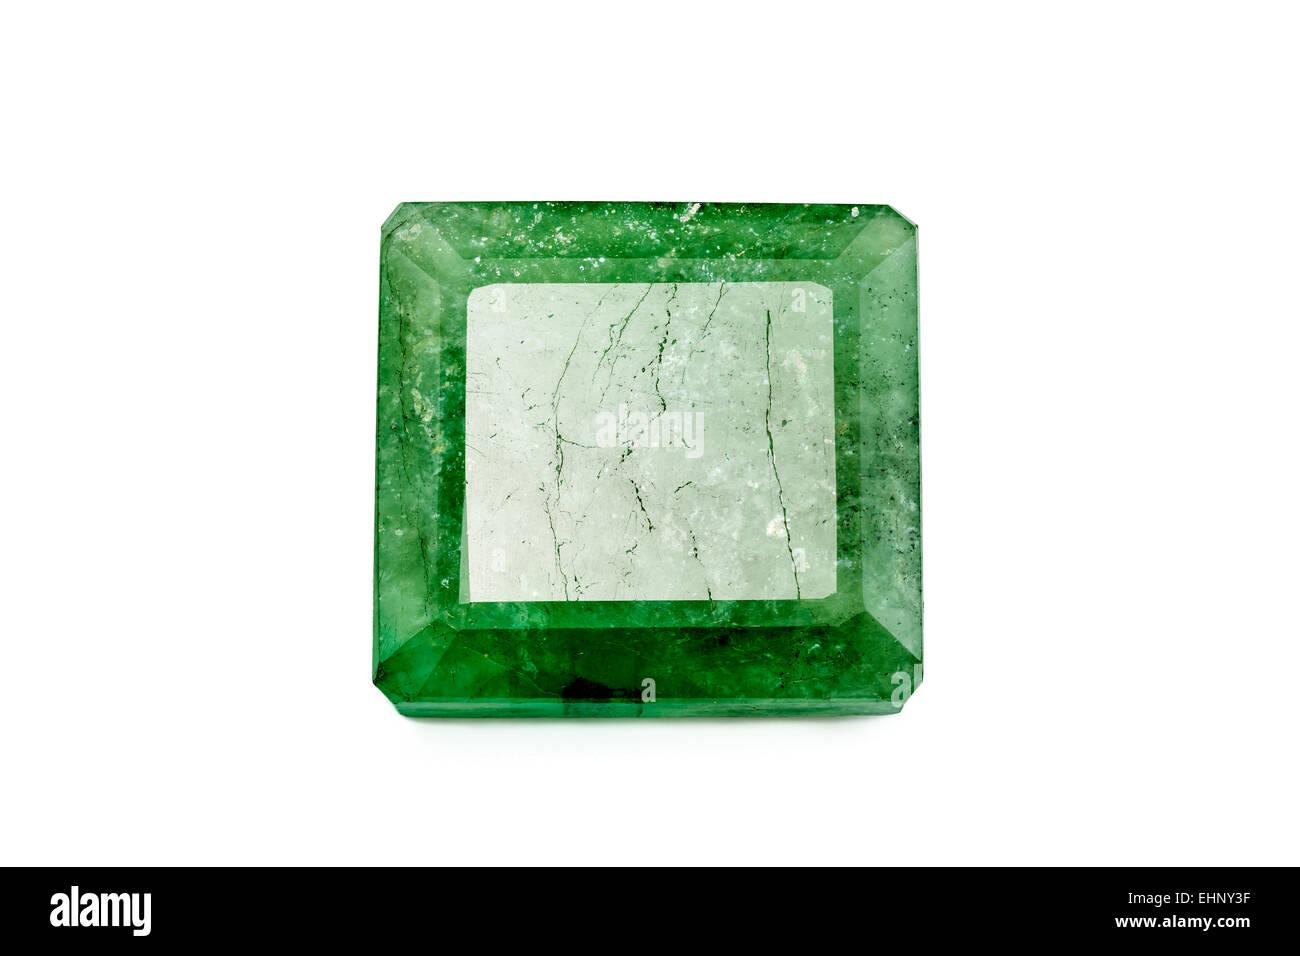 Emerald (Beryl) step-cut Weight: unknown Crystal structure: hexagonal Composition: Beryllium aluminium silicate - Stock Image